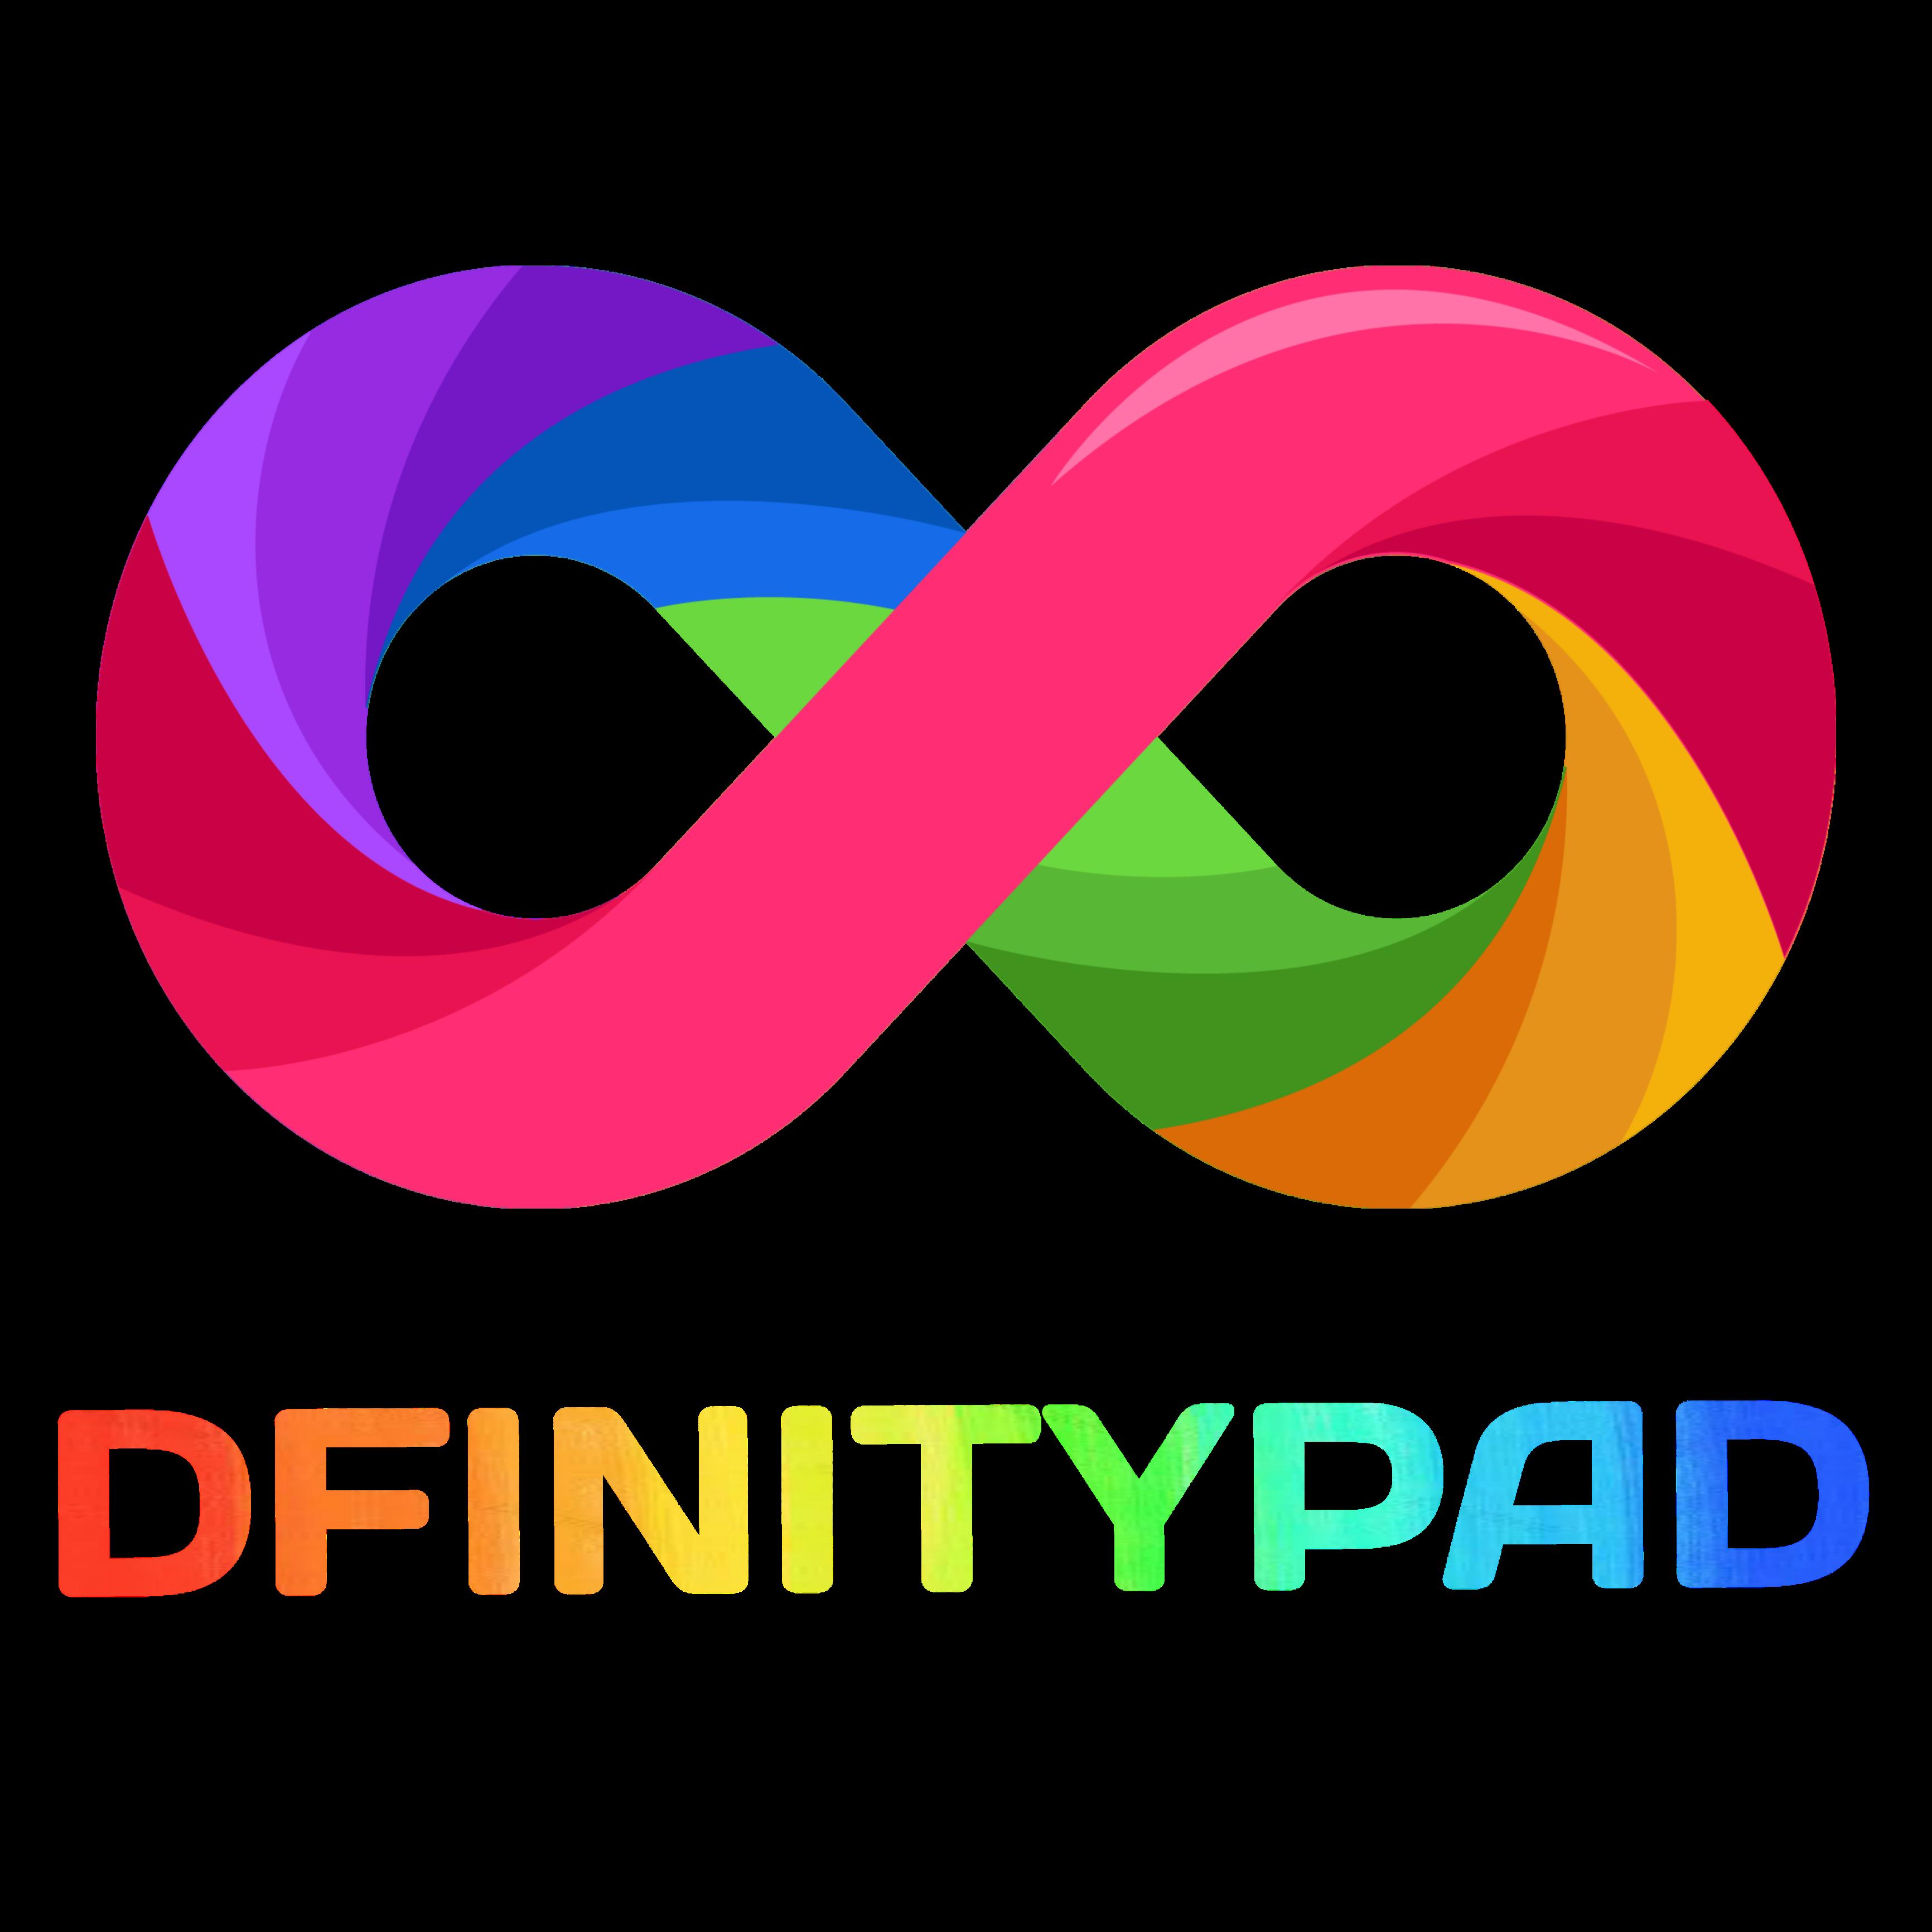 https://solidproof.io/storage/logos/rxJJz7obnUtdAUN4OtcIqsCfFMLqQ7bxuYyzzeT8.png